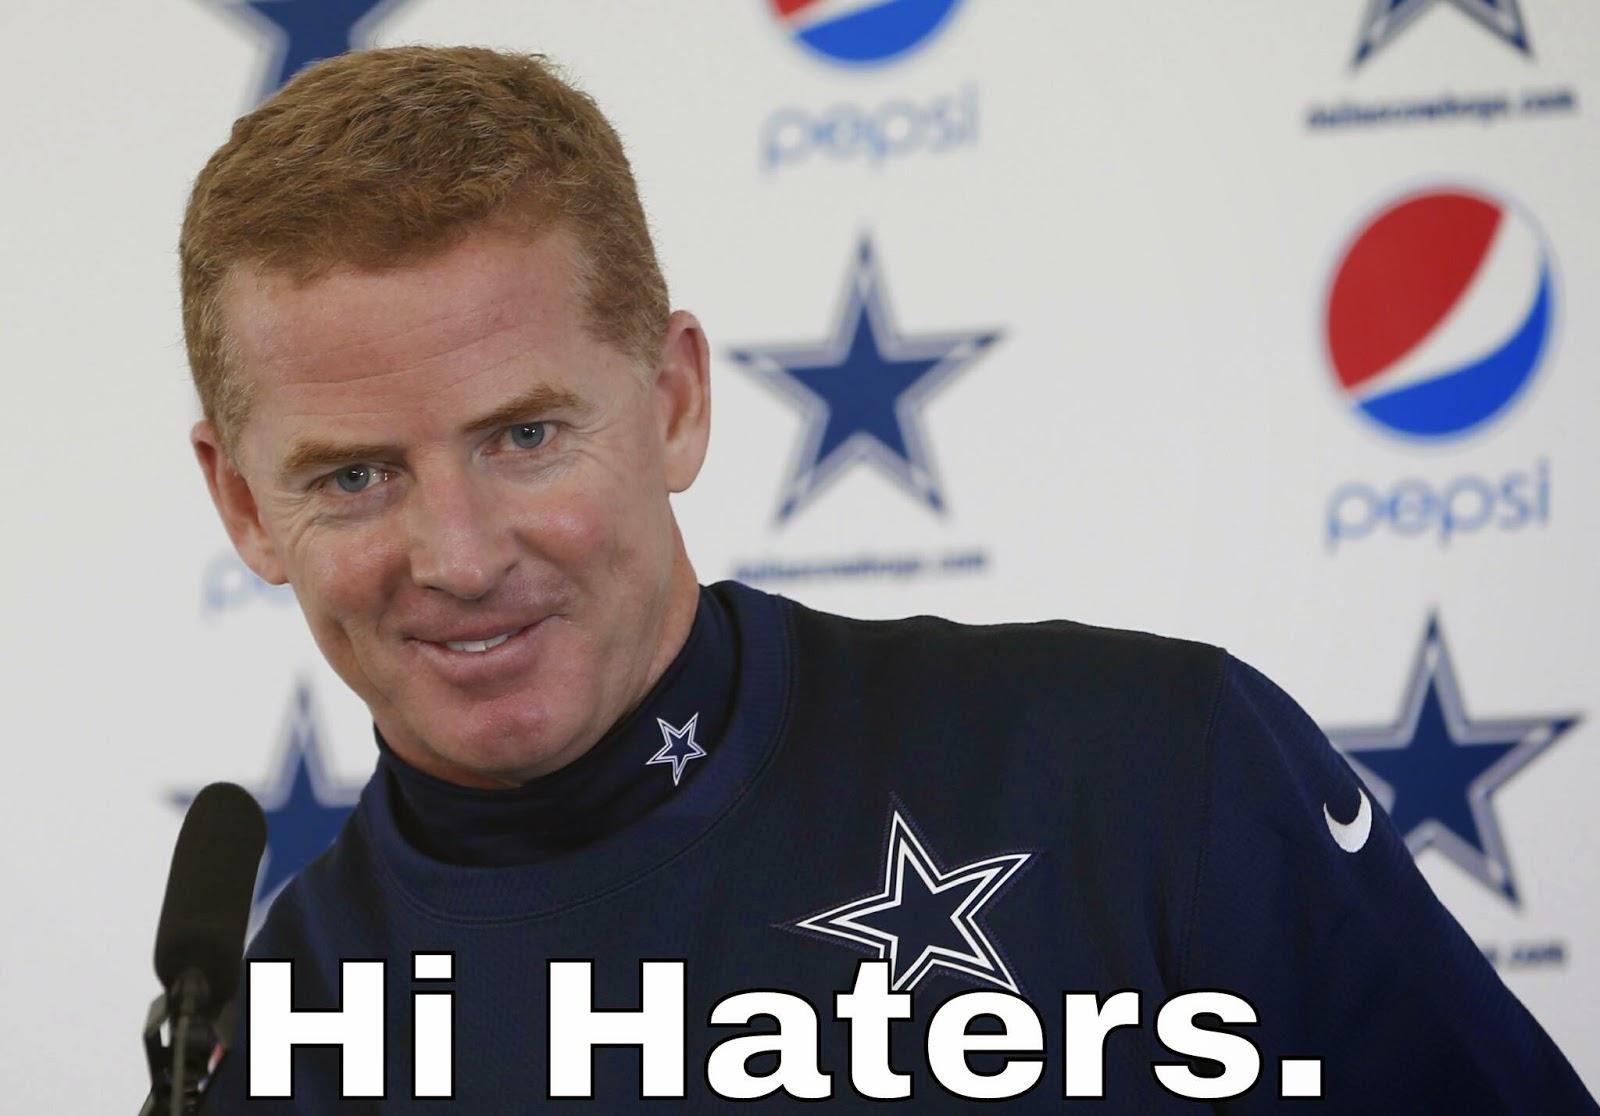 Hi haters. #cowboys #CoachCowboys #JasonGarrett